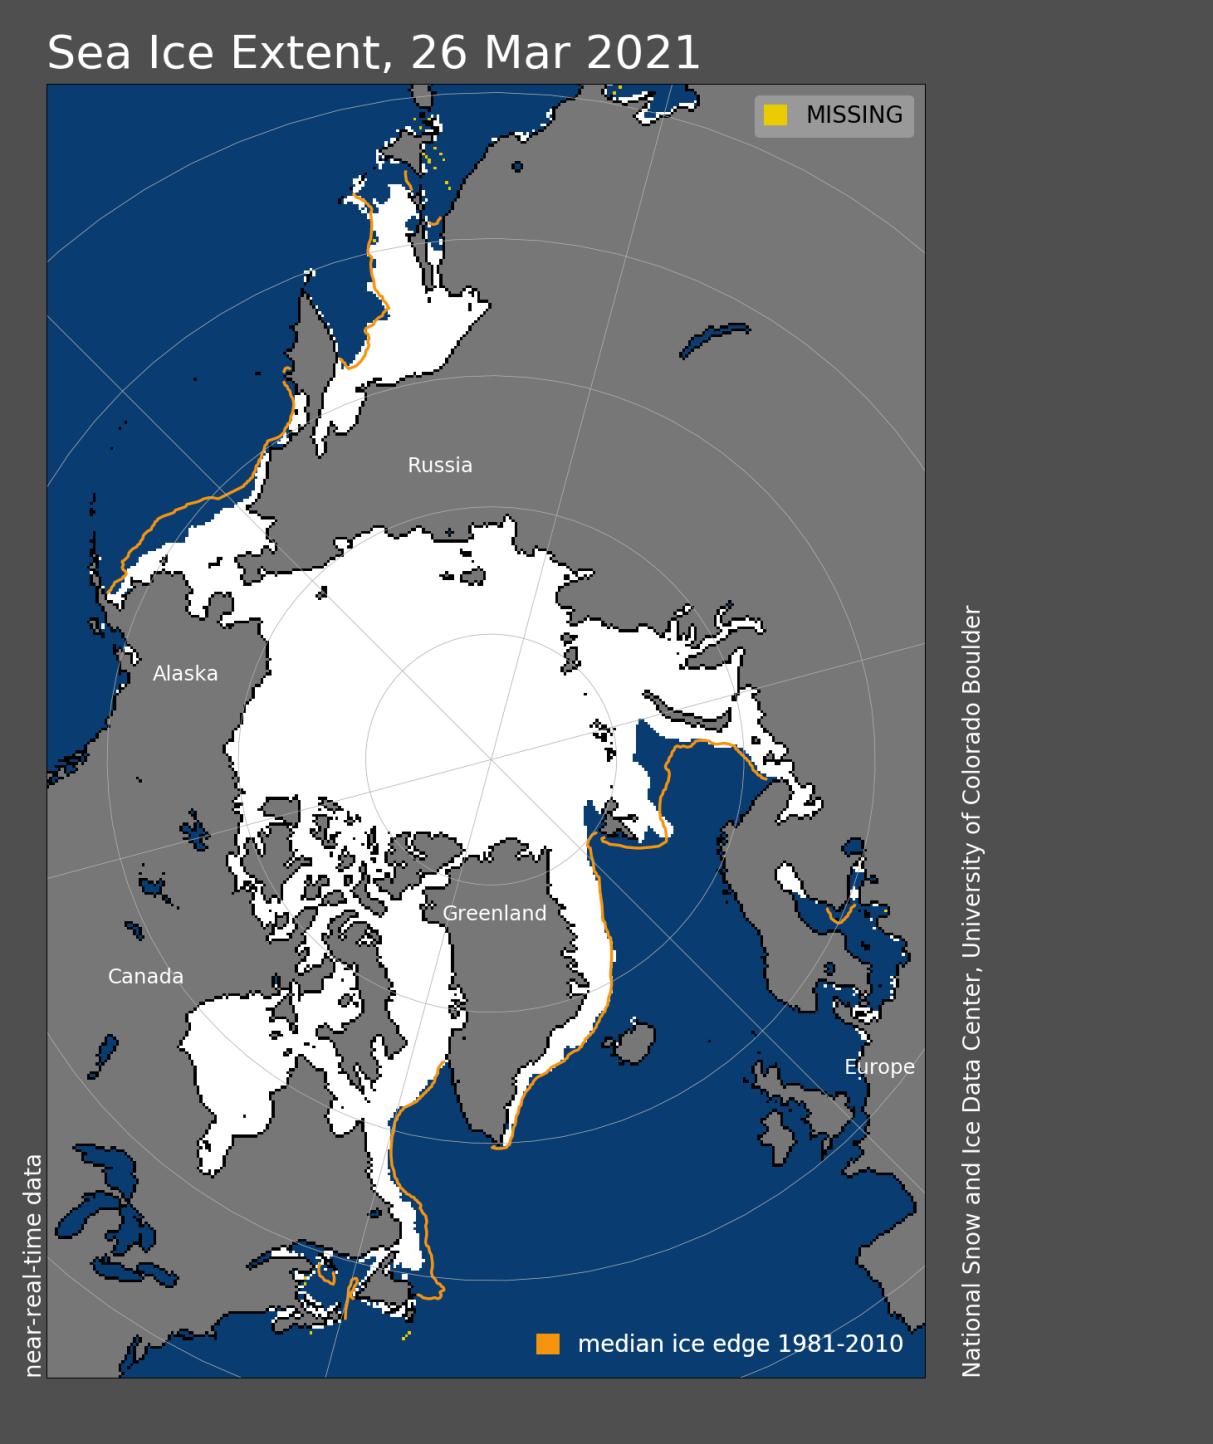 arctic-sea-ice-maximum-2021-melt-extent-analysis